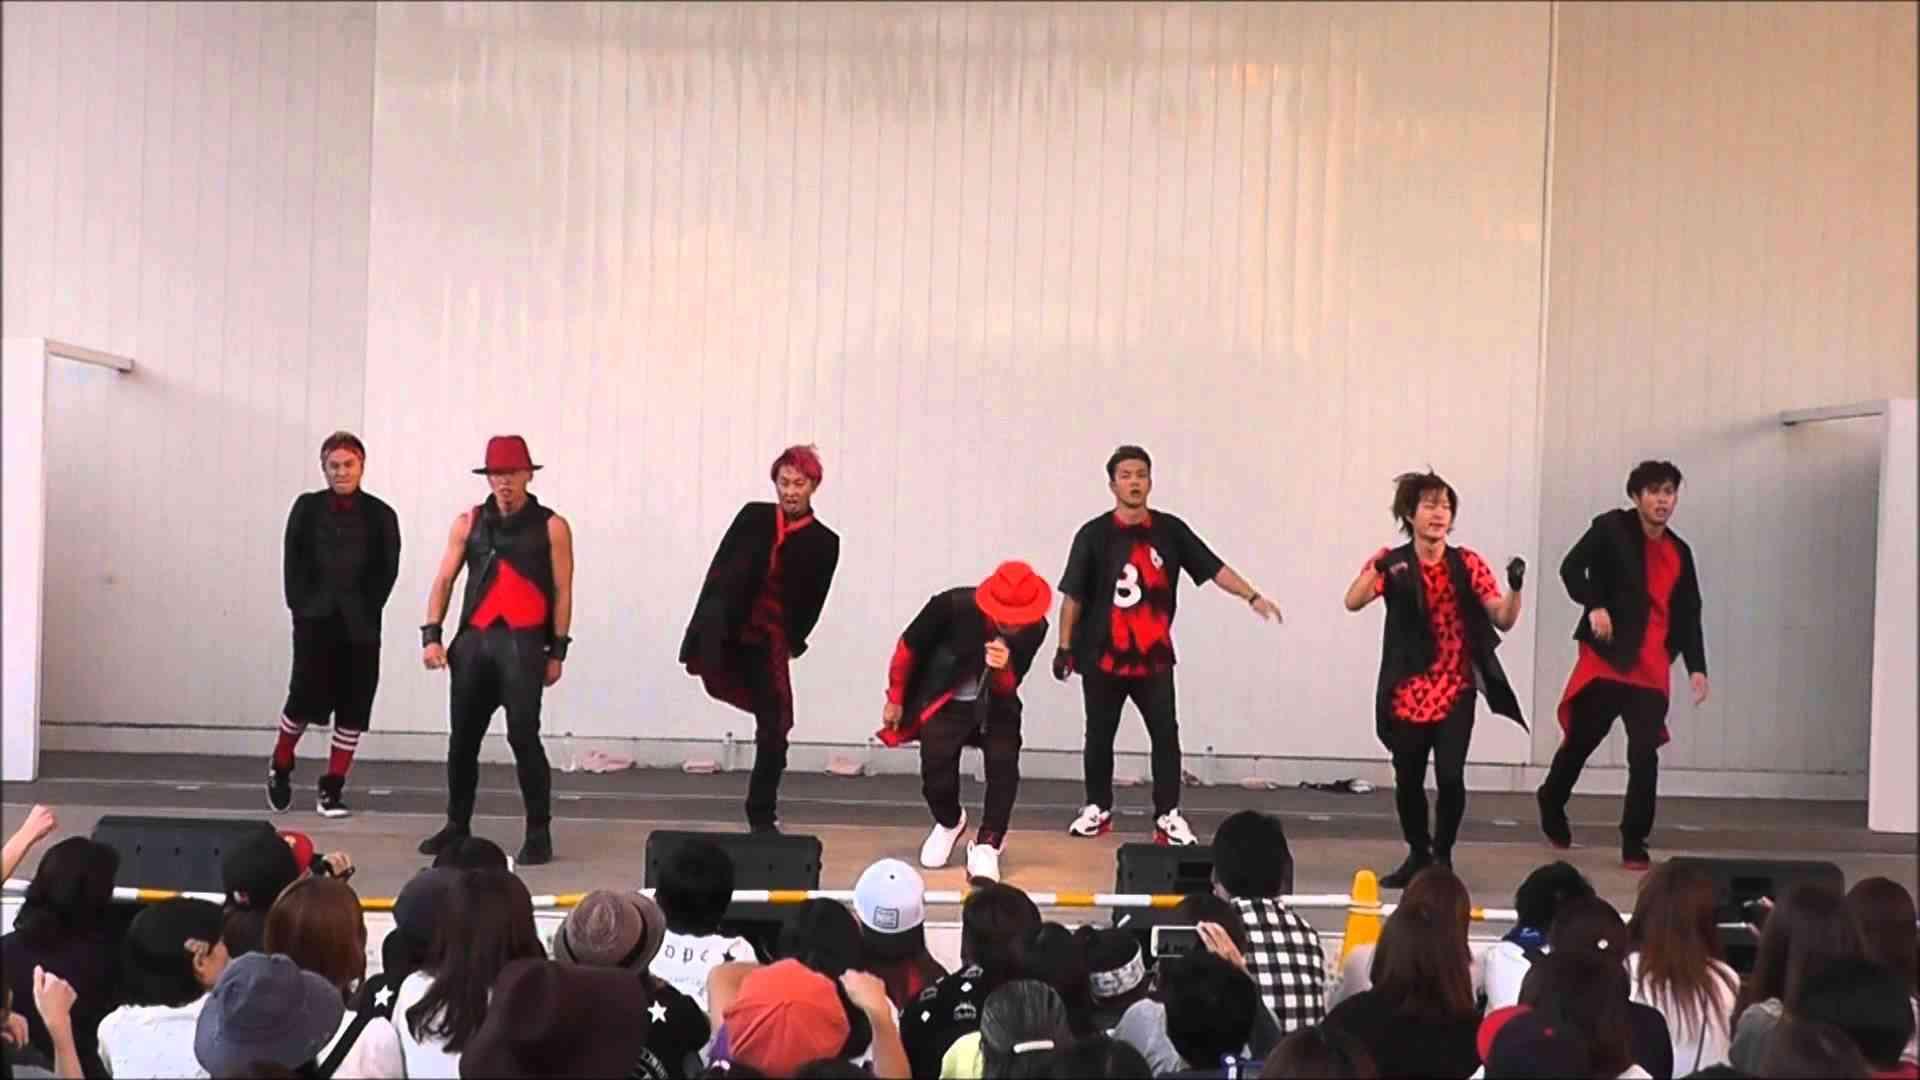 DA PUMP ミニライブ 新曲 『New Position』 2014/9/23 - YouTube